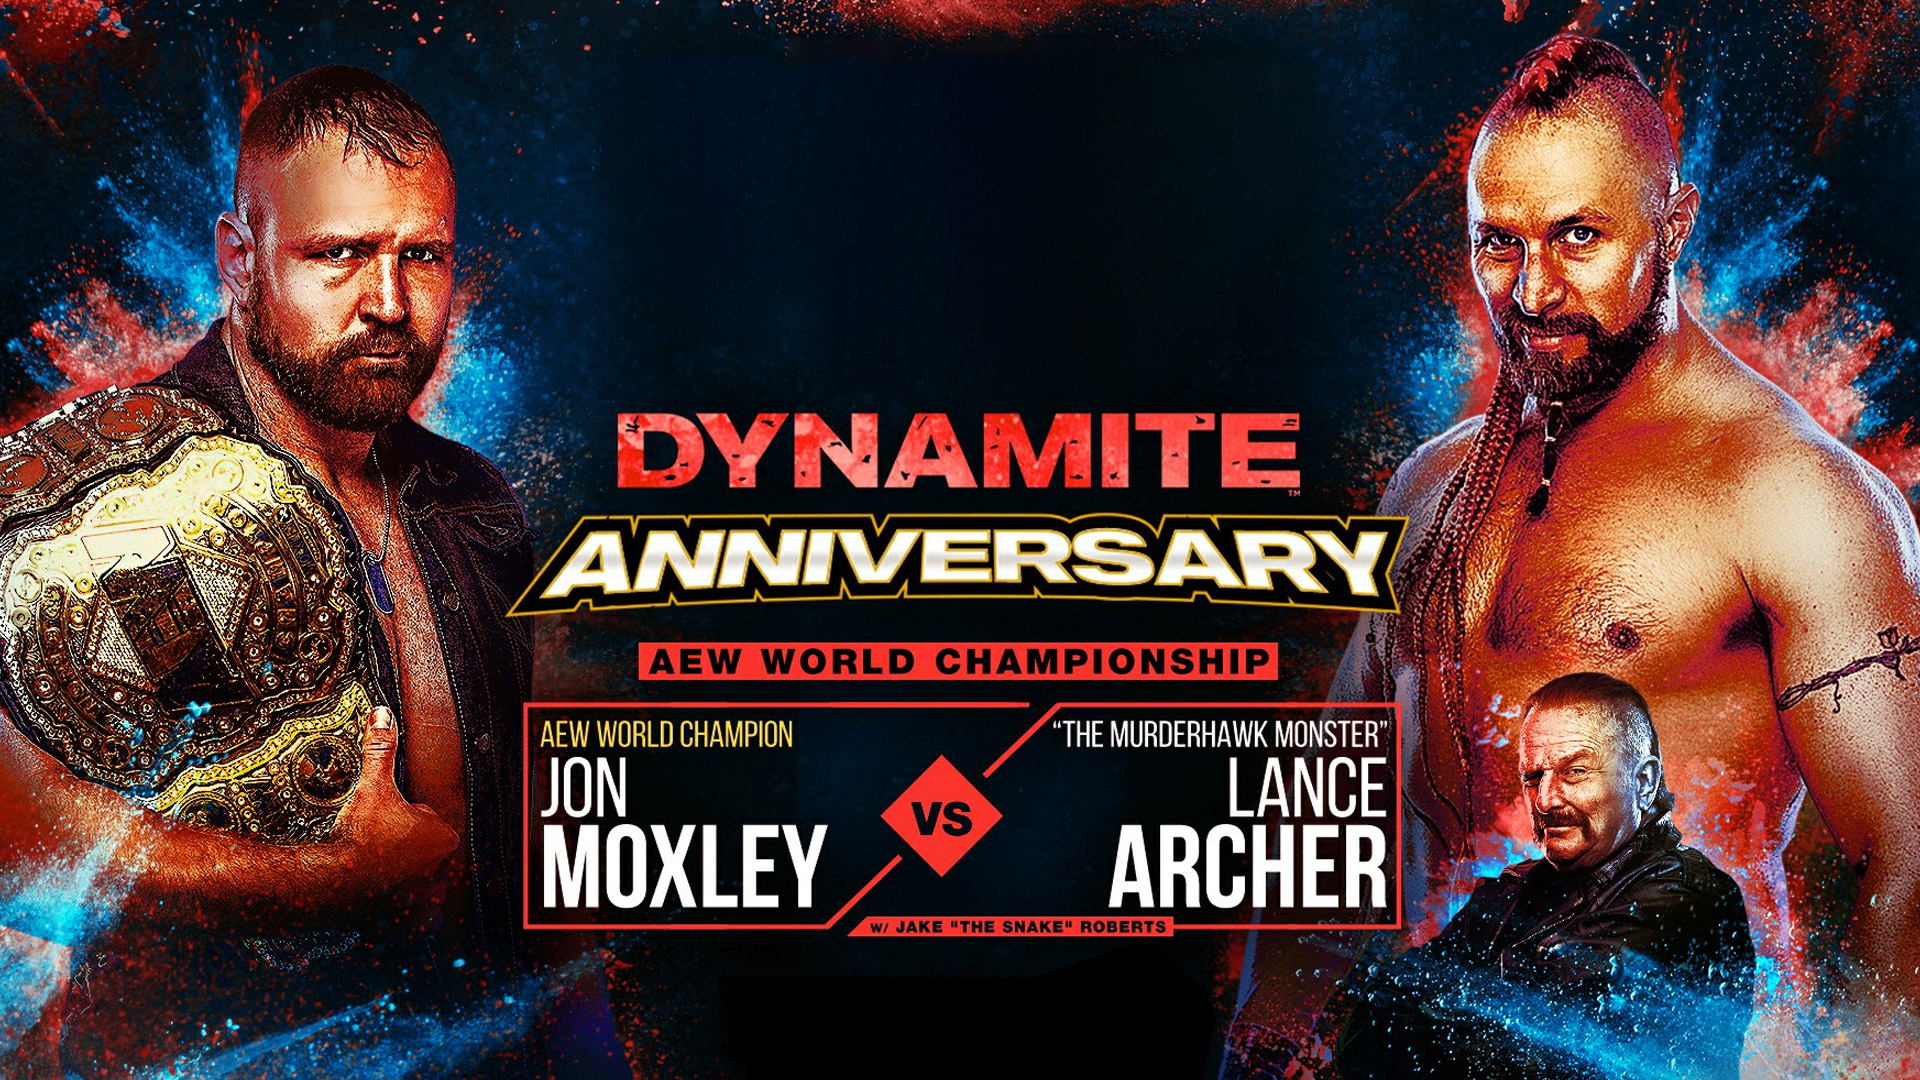 AEW Dynamite: Anniversary Edition